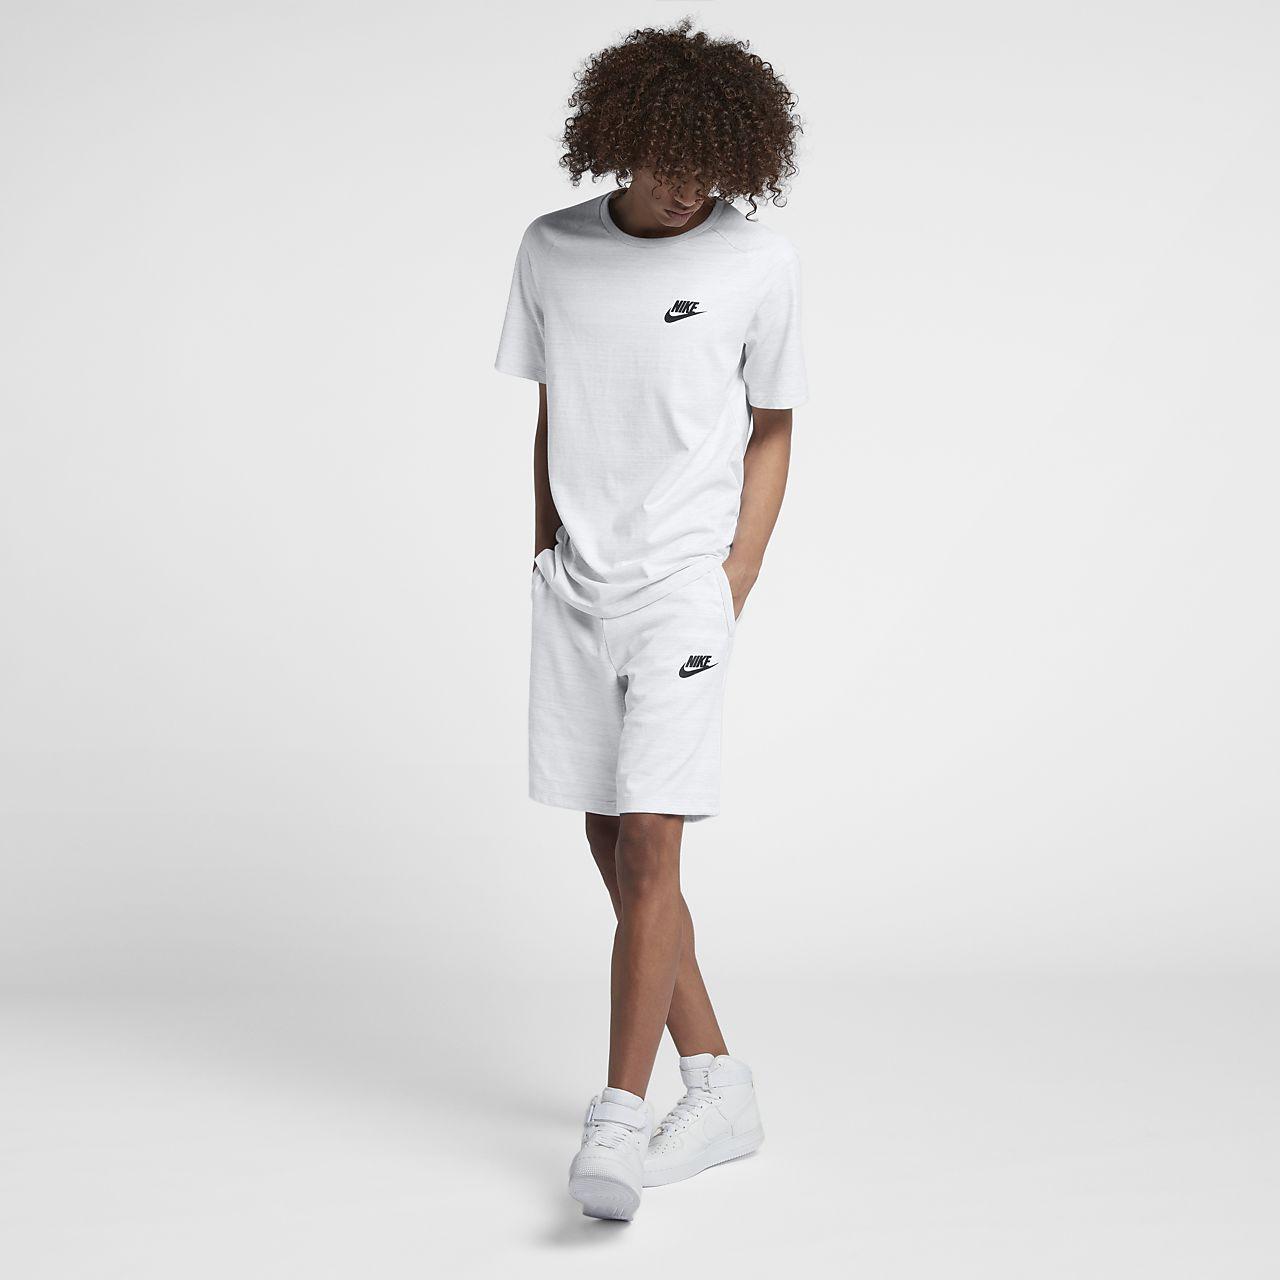 giacca in maglia nike sportswear advance 15 uomo